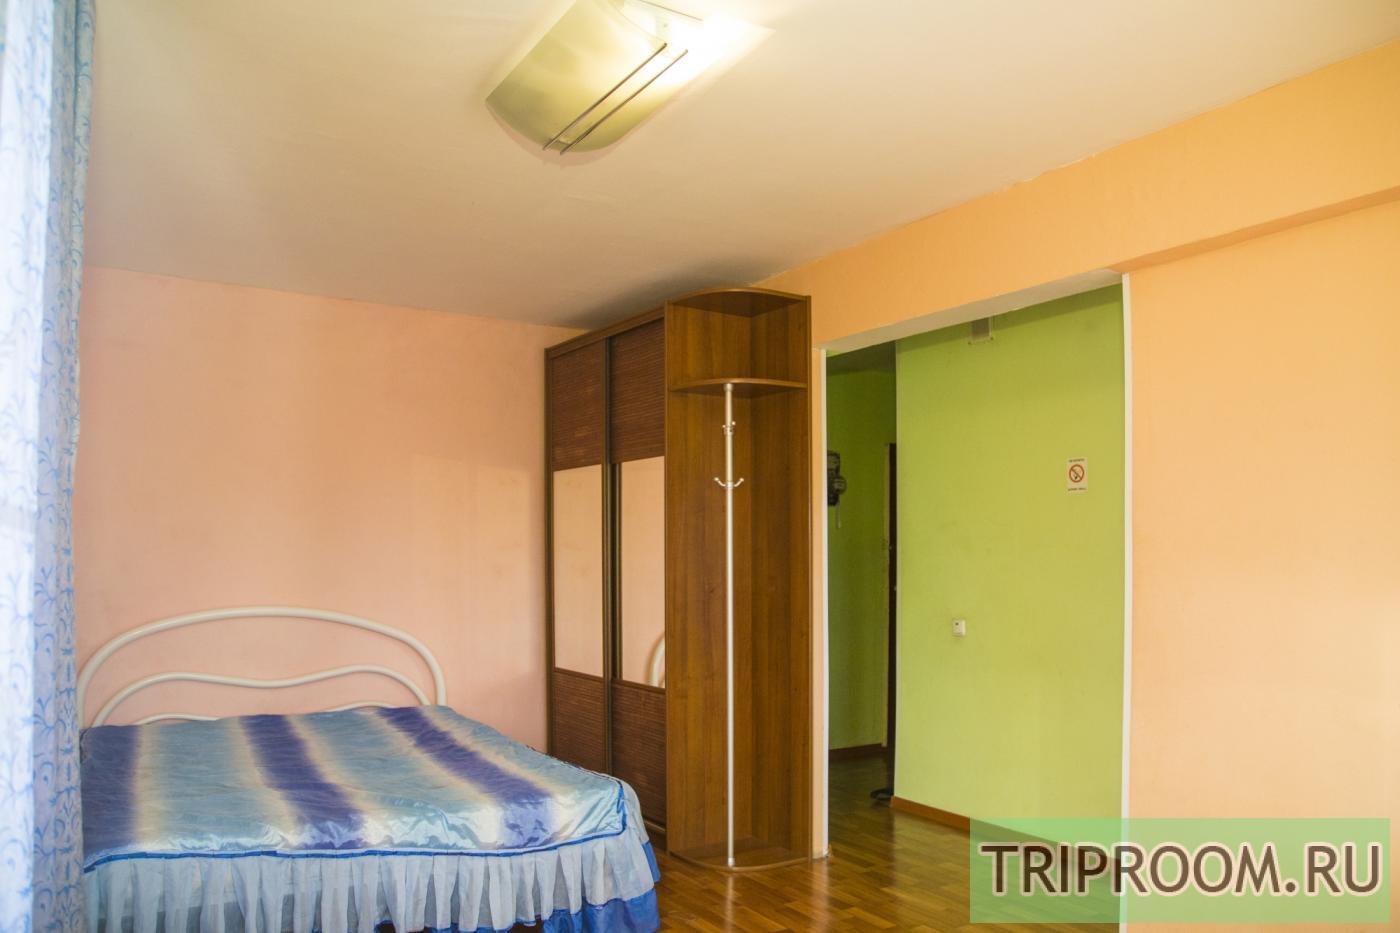 1-комнатная квартира посуточно (вариант № 6615), ул. Александра Матросова улица, фото № 2